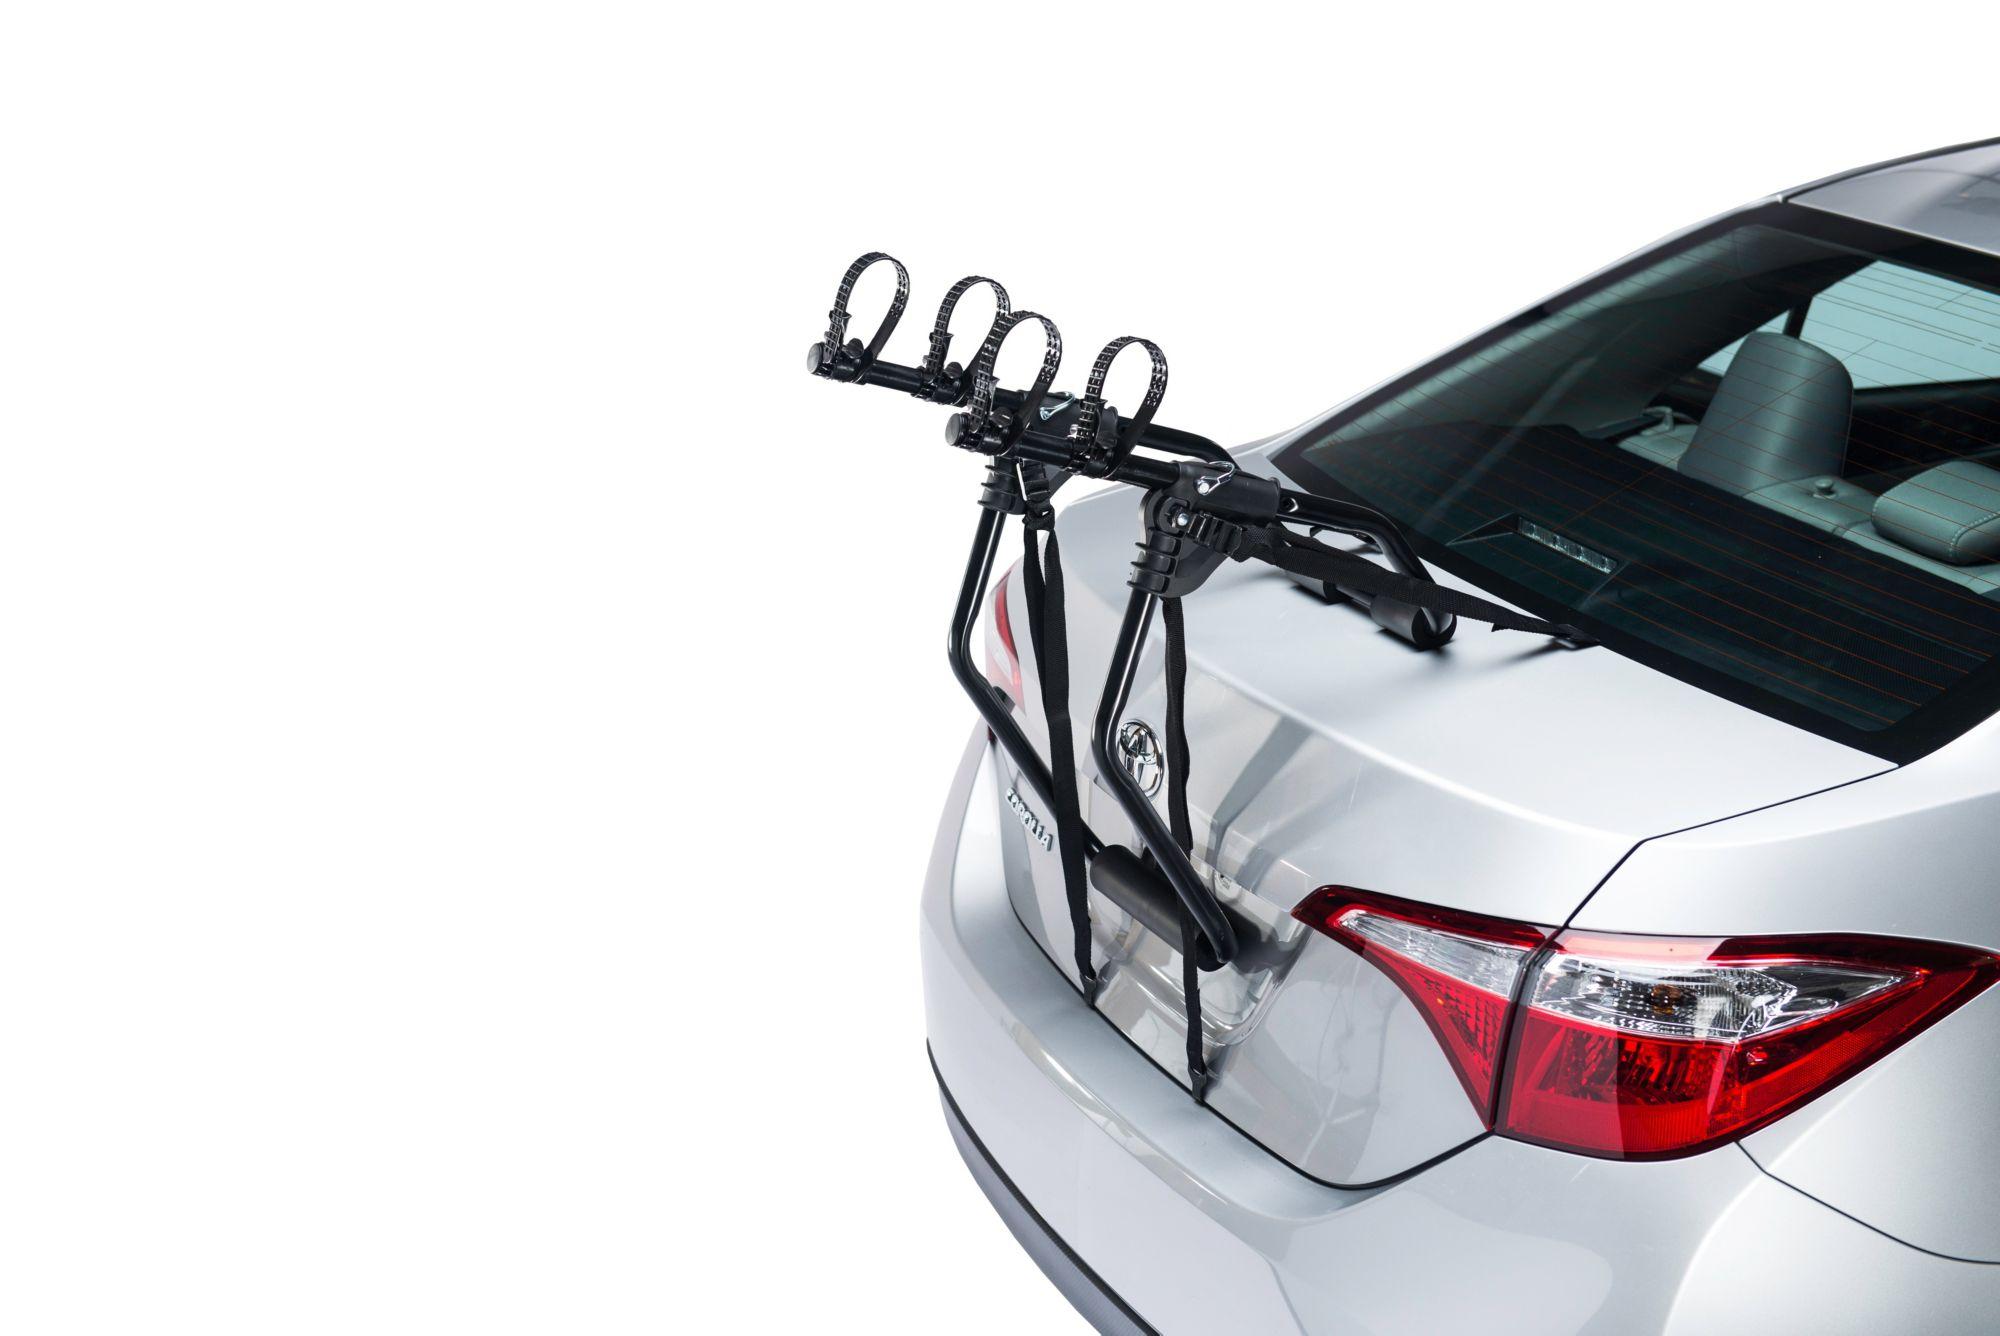 Schwinn Signature Trunk Mount 2 Bike Rack Dicks Sporting Goods